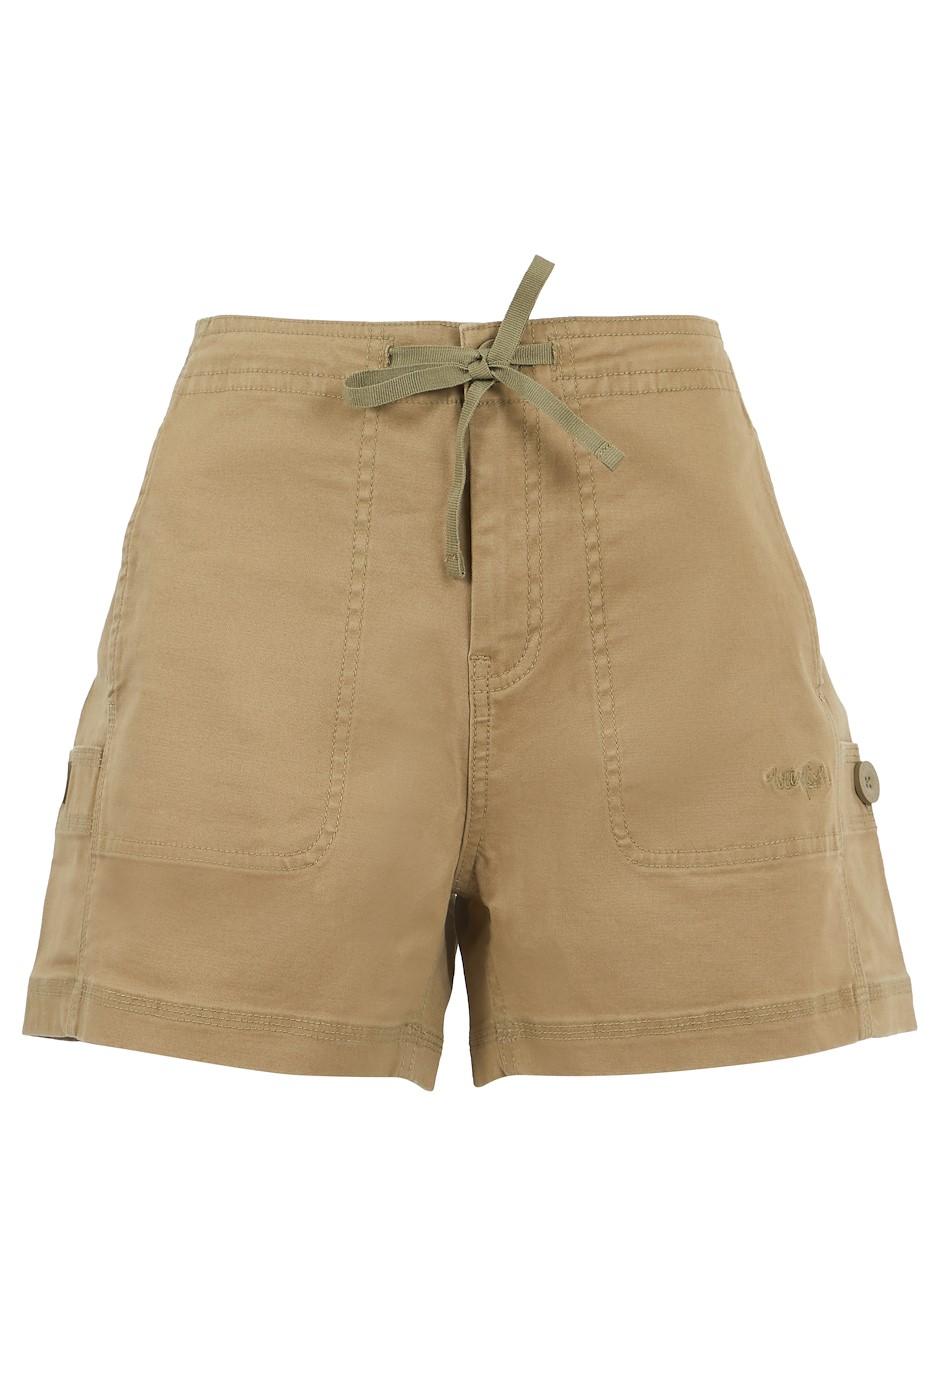 Willoughby Organic Cotton Shorts Khaki